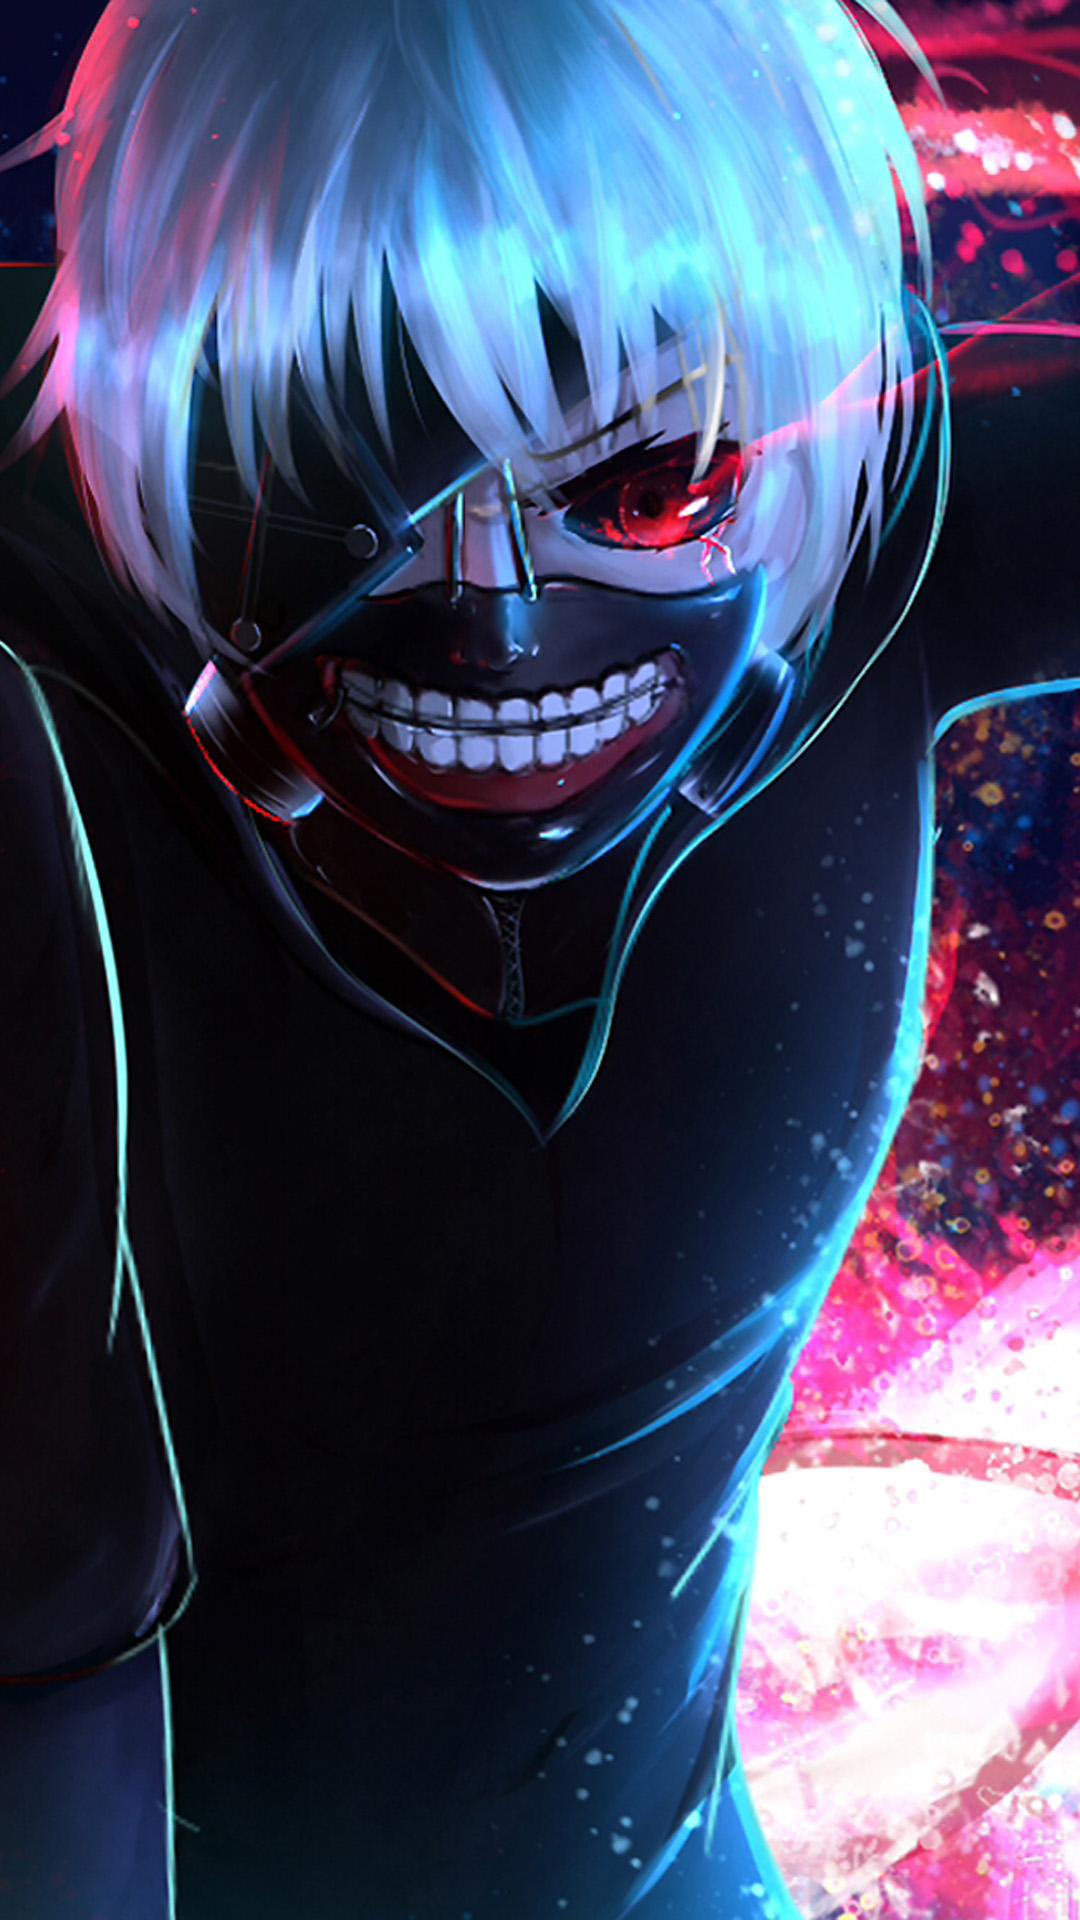 One Eye Tokyo Ghoul 4k Ultra Hd Mobile Wallpaper